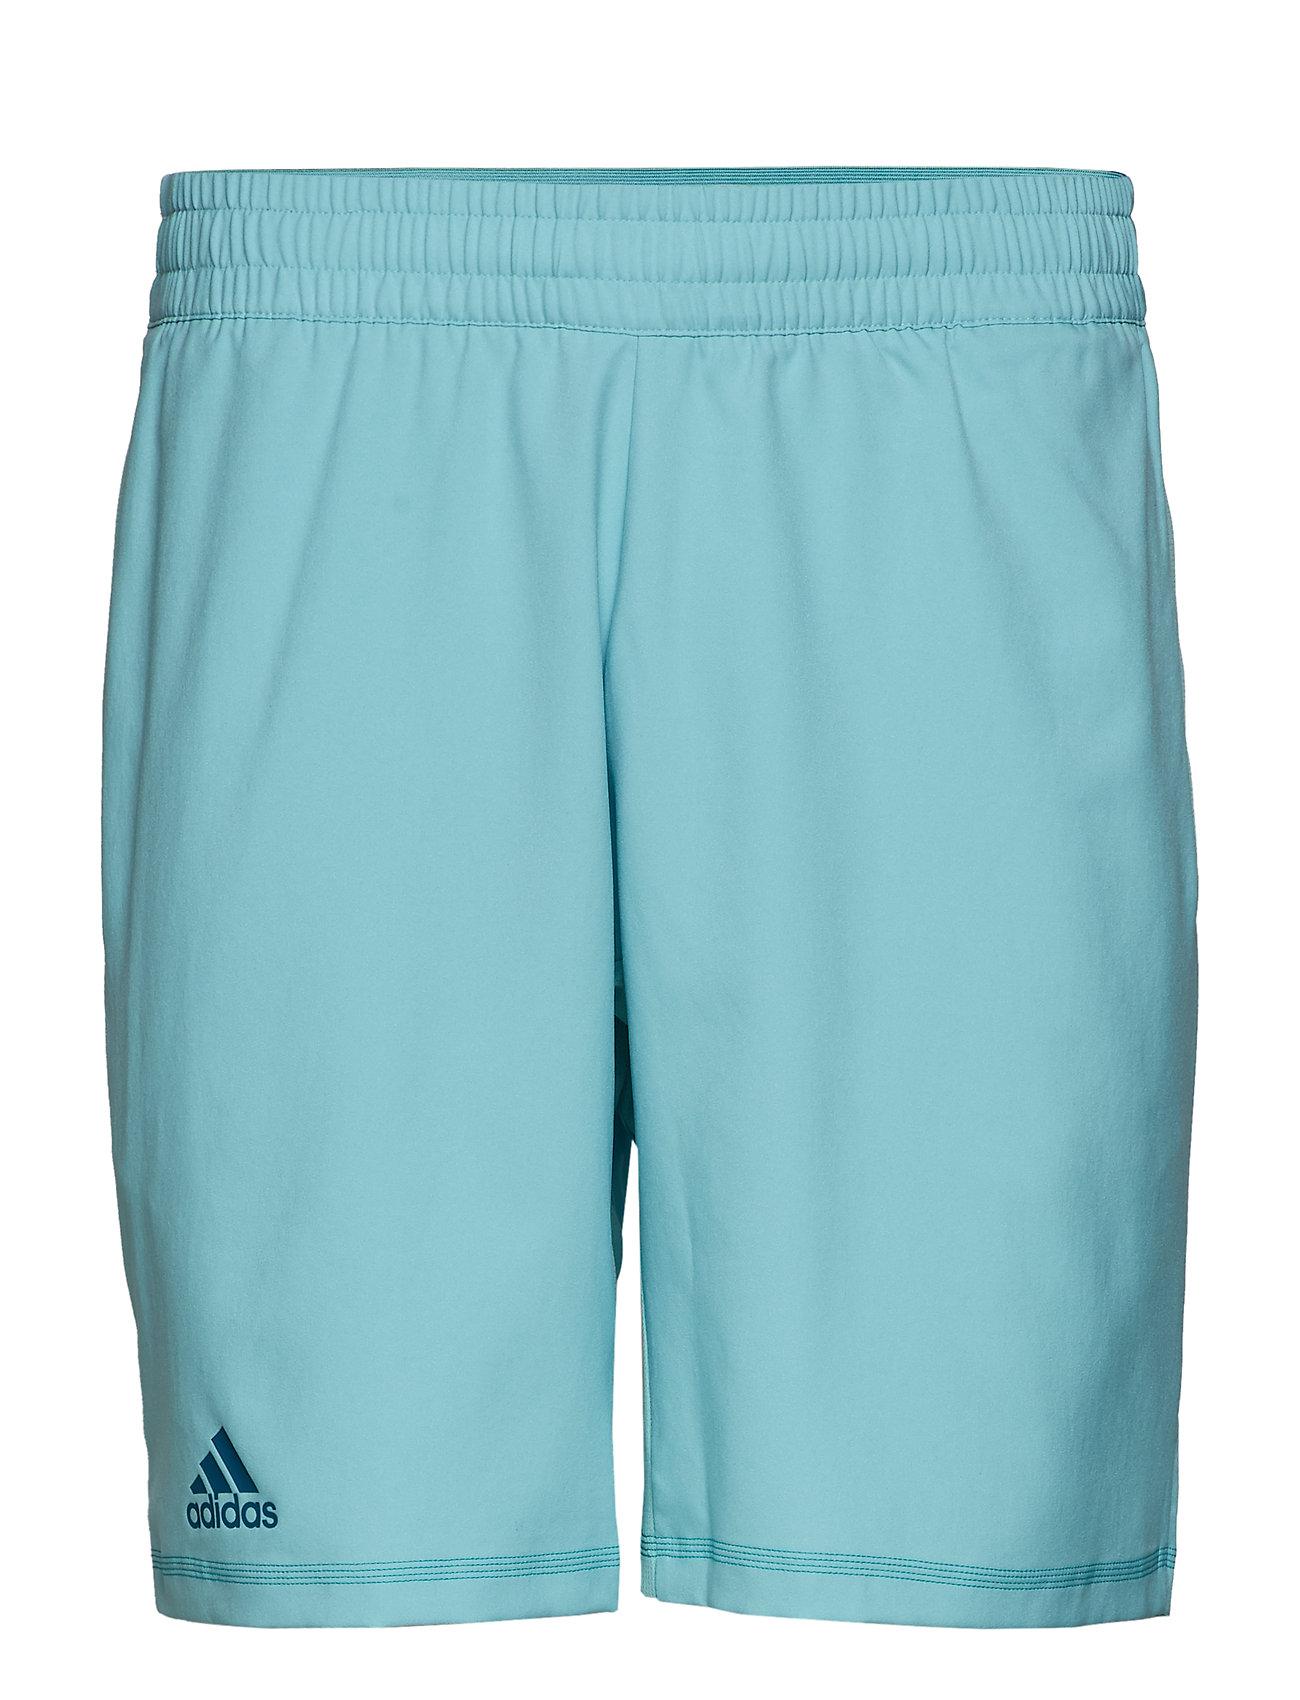 adidas Tennis PARLEY SHORT 9 M - GREEN